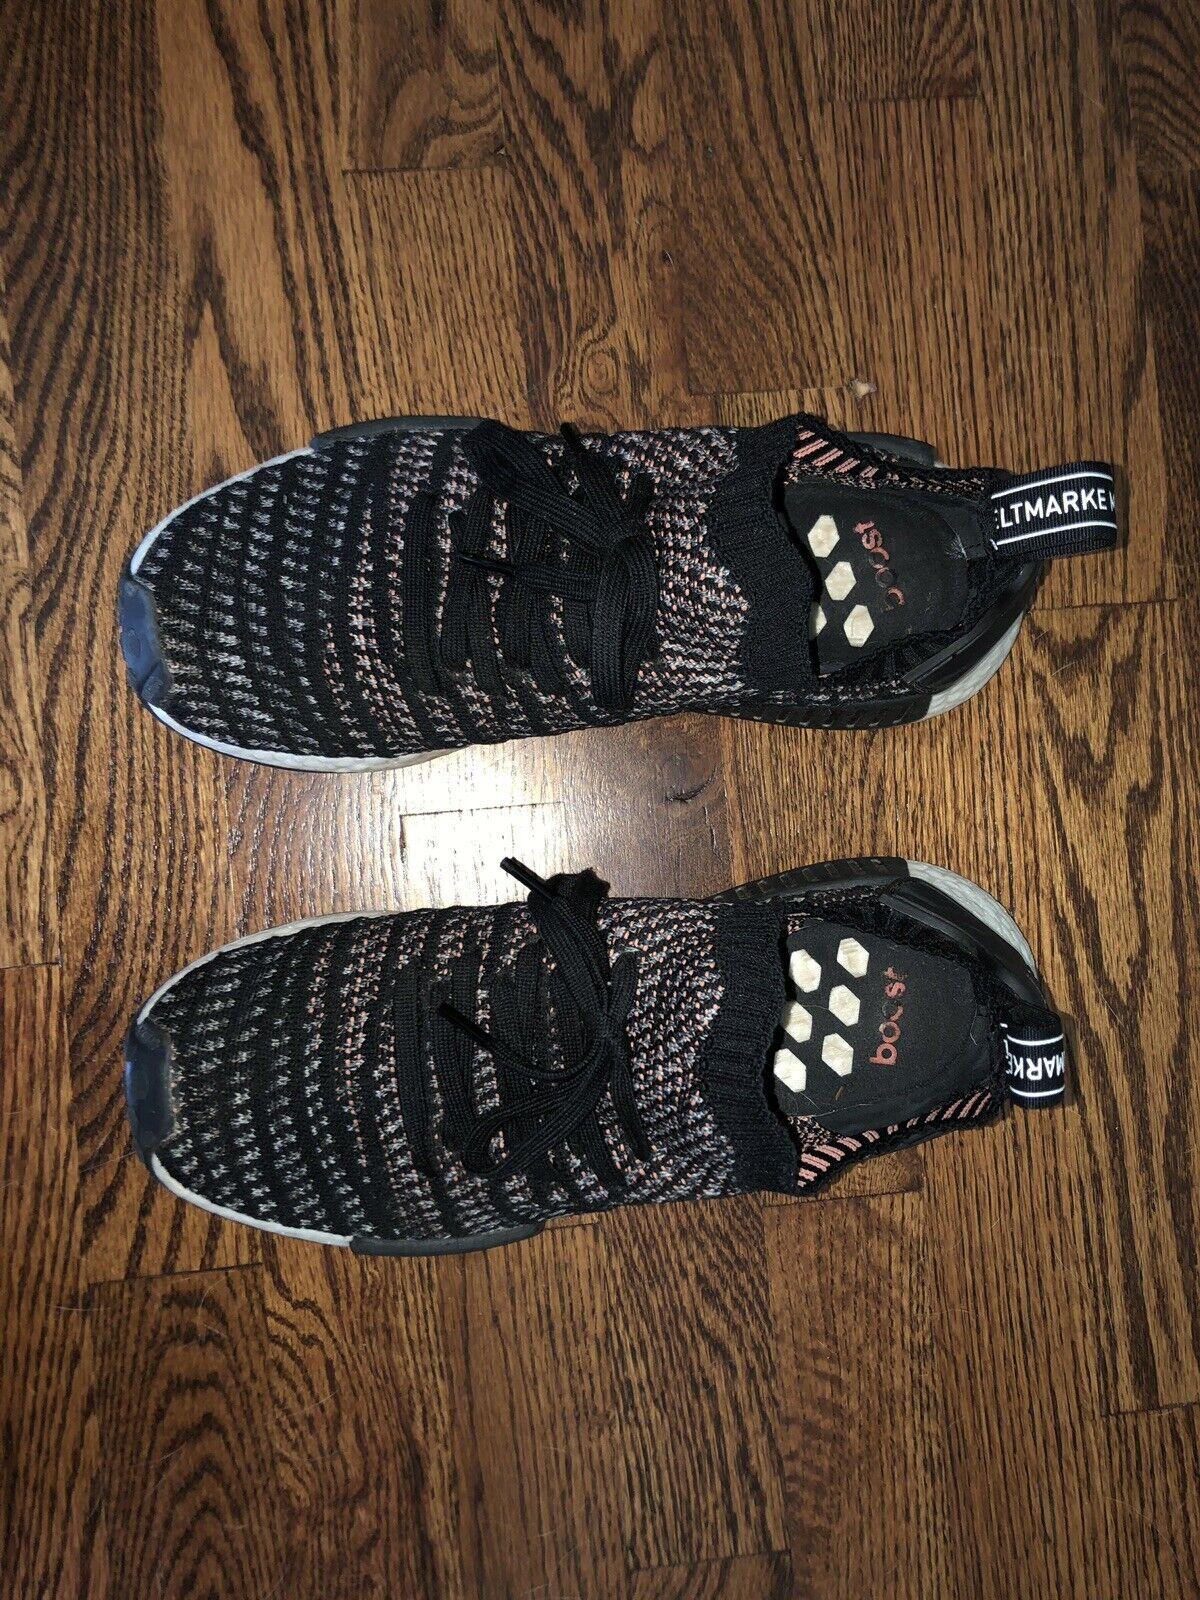 29b6892a37c24 Adidas NMD R1 Primeknit Size 10 Running Running Running shoes 5d8388 ...